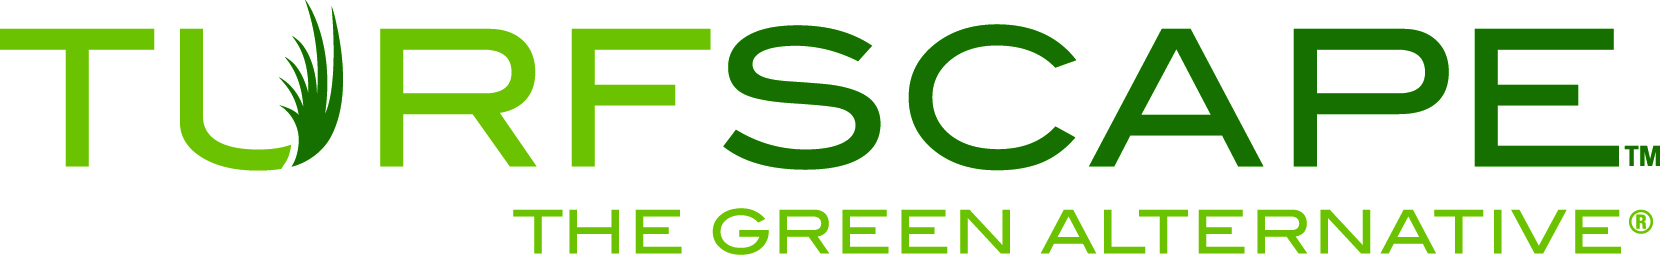 TS Turscape Logo